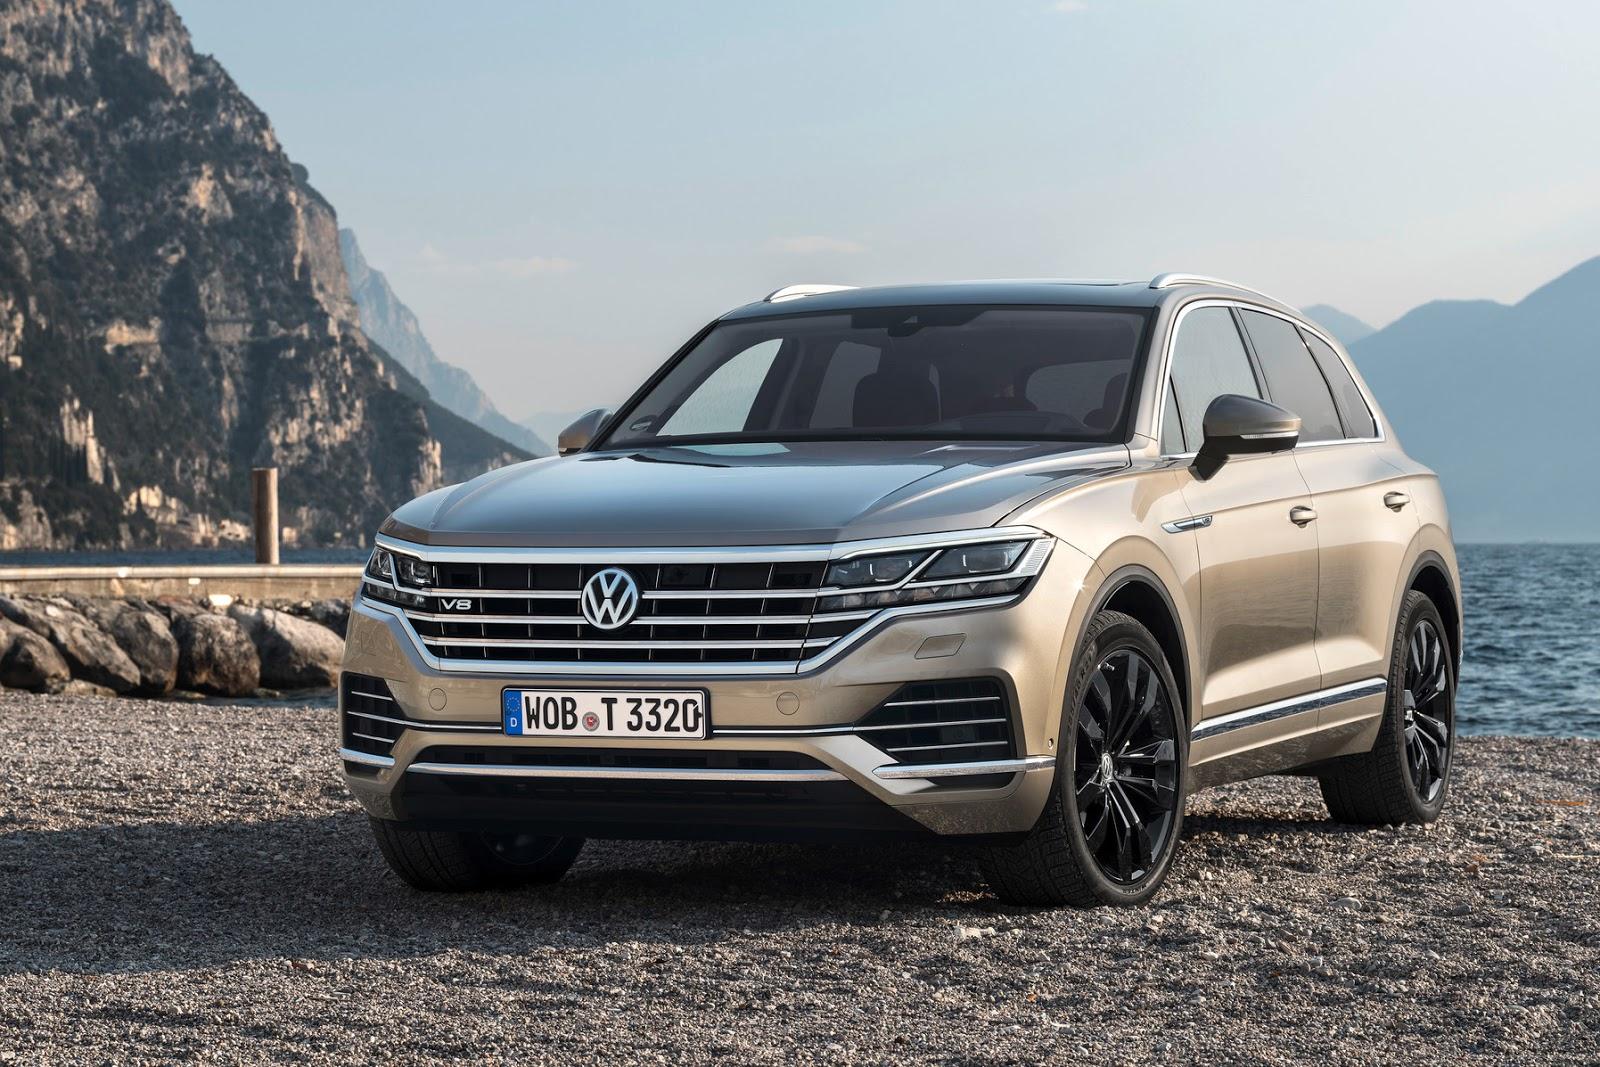 Touareg2BV8 Με 4 πρεμιέρες στη Γενεύη η Volkswagen Volkswagen, VW, Έκθεση Γενεύης, Σαλόνι Αυτοκινήτου της Γενεύης